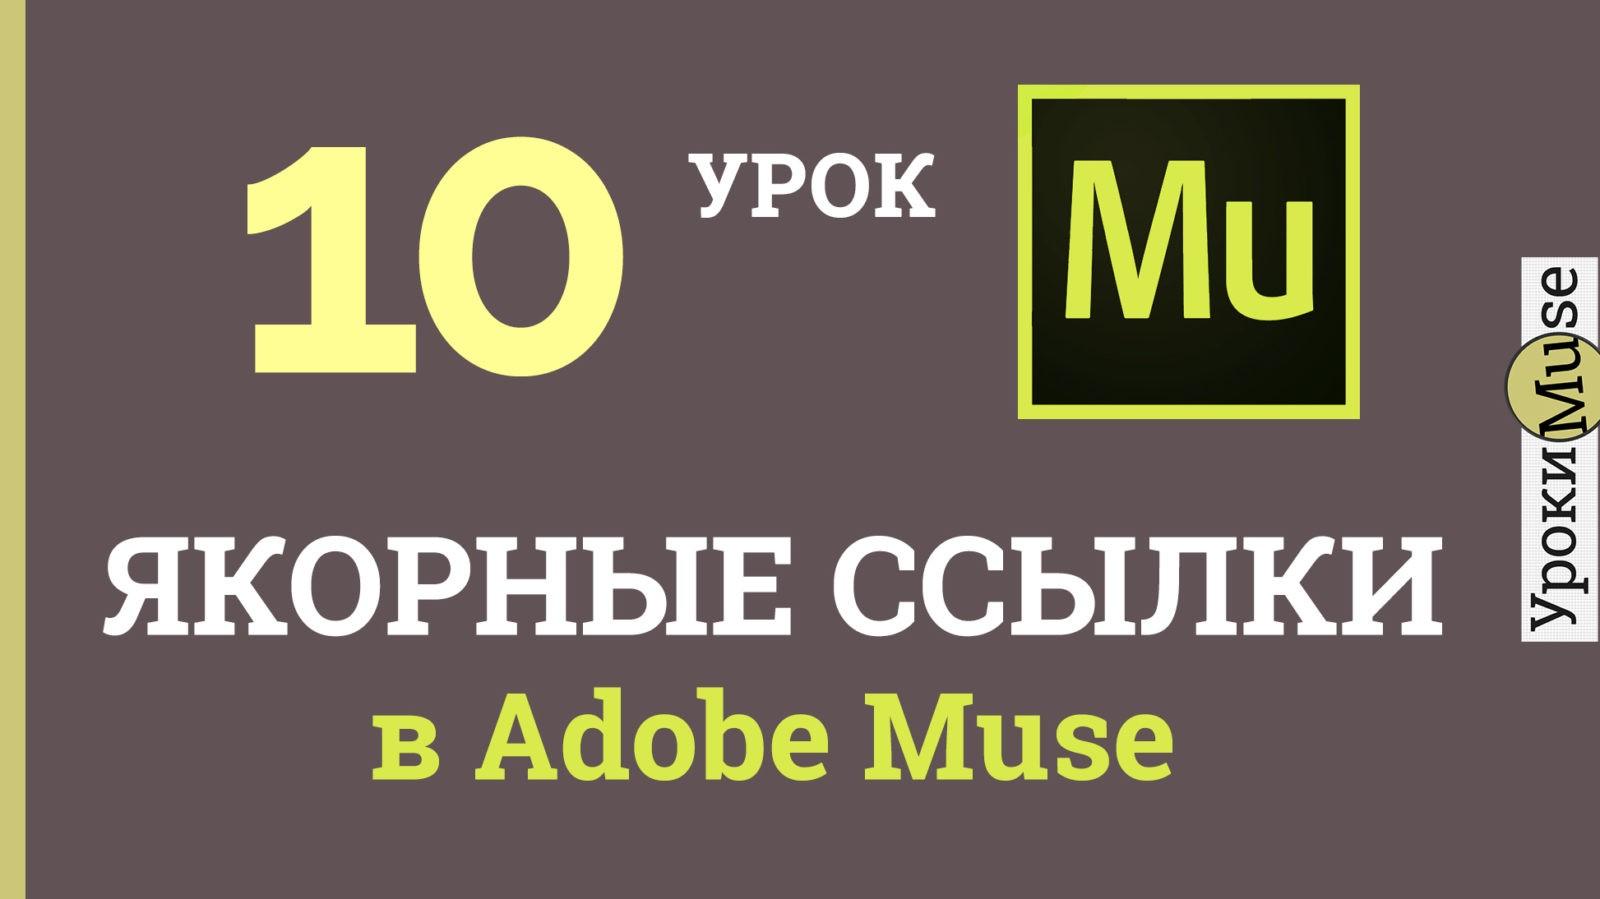 Якорные ссылки Adobe Muse